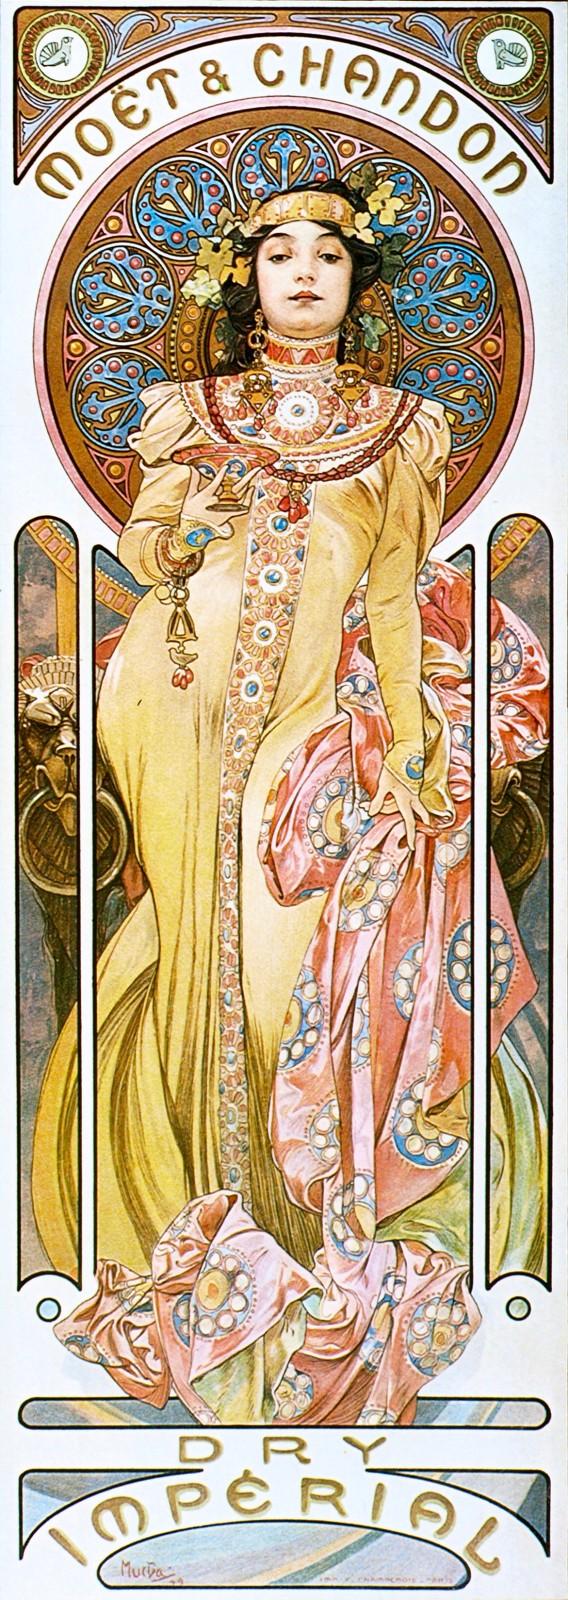 Реклама шампанского Dry Imperial марки Moet & Chandon-1899